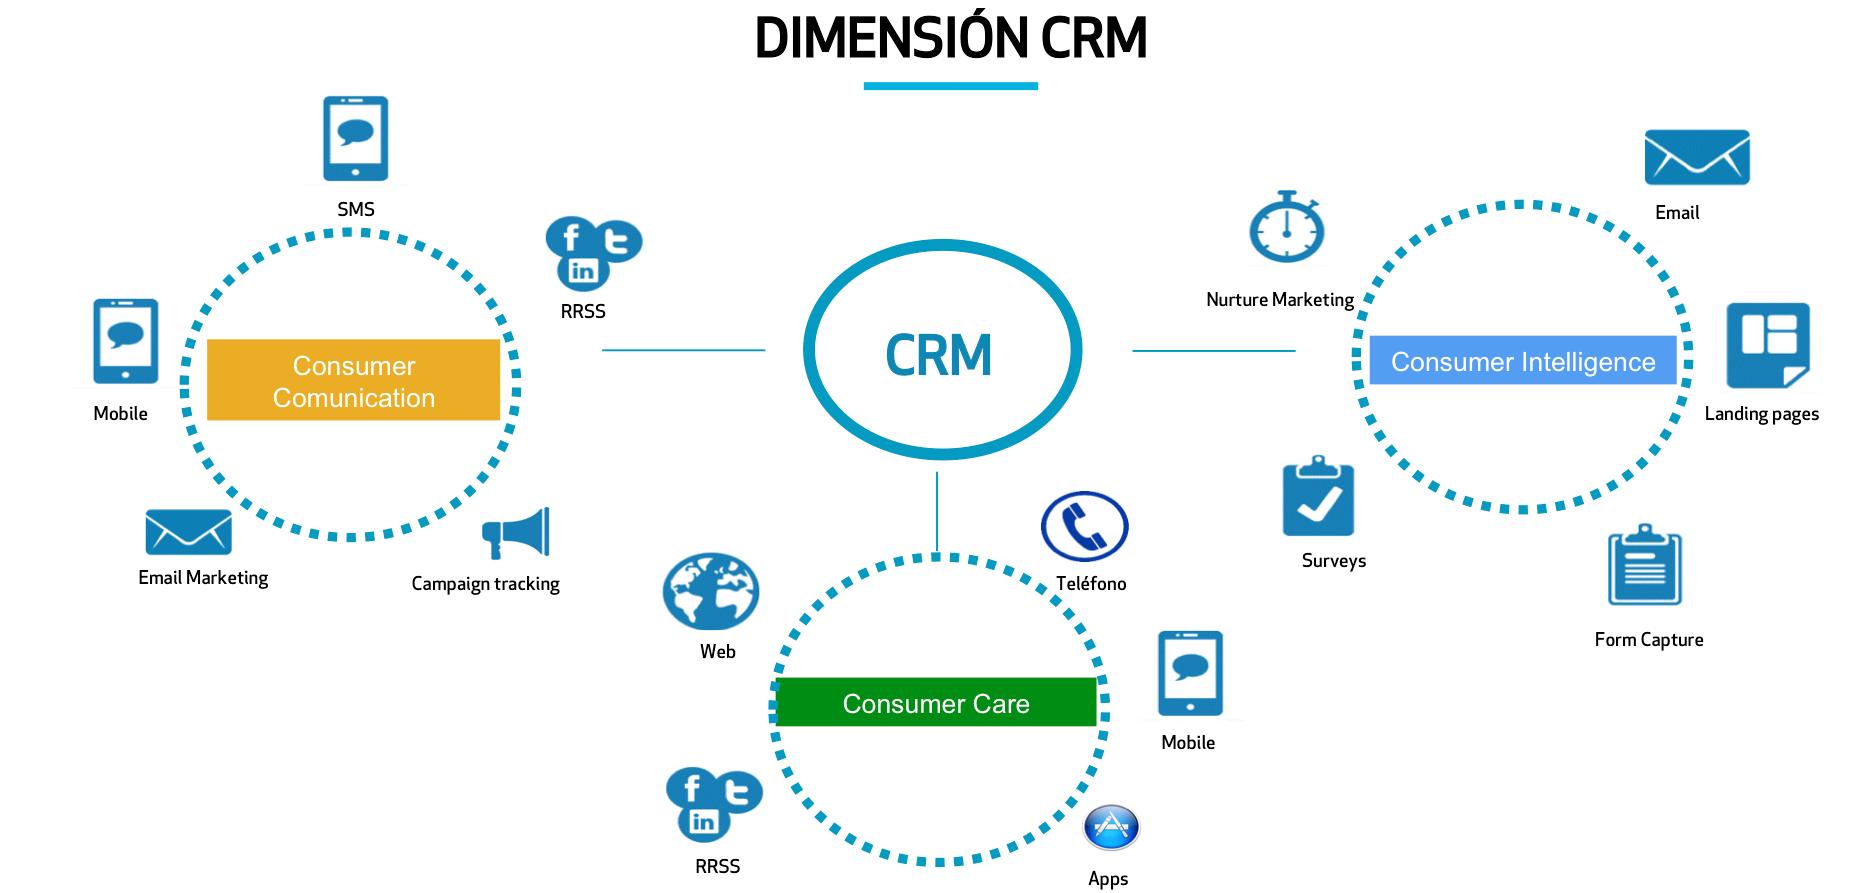 INCIPY-casos-de-exito-estrategia-digital-3 claveles dimension CRM